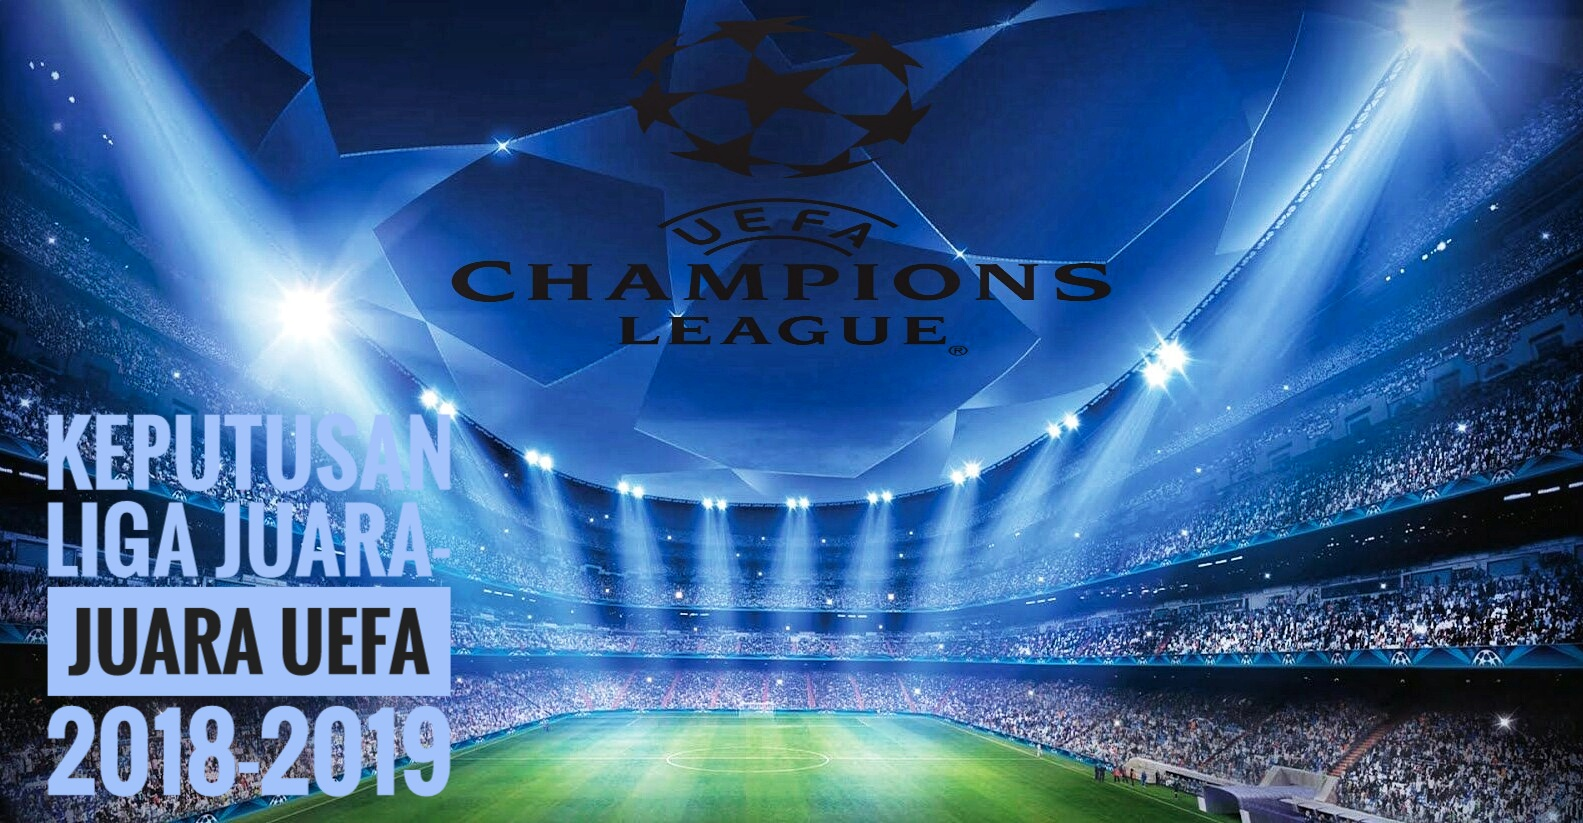 Keputusan Liga Juara-Juara UEFA 2018-2019